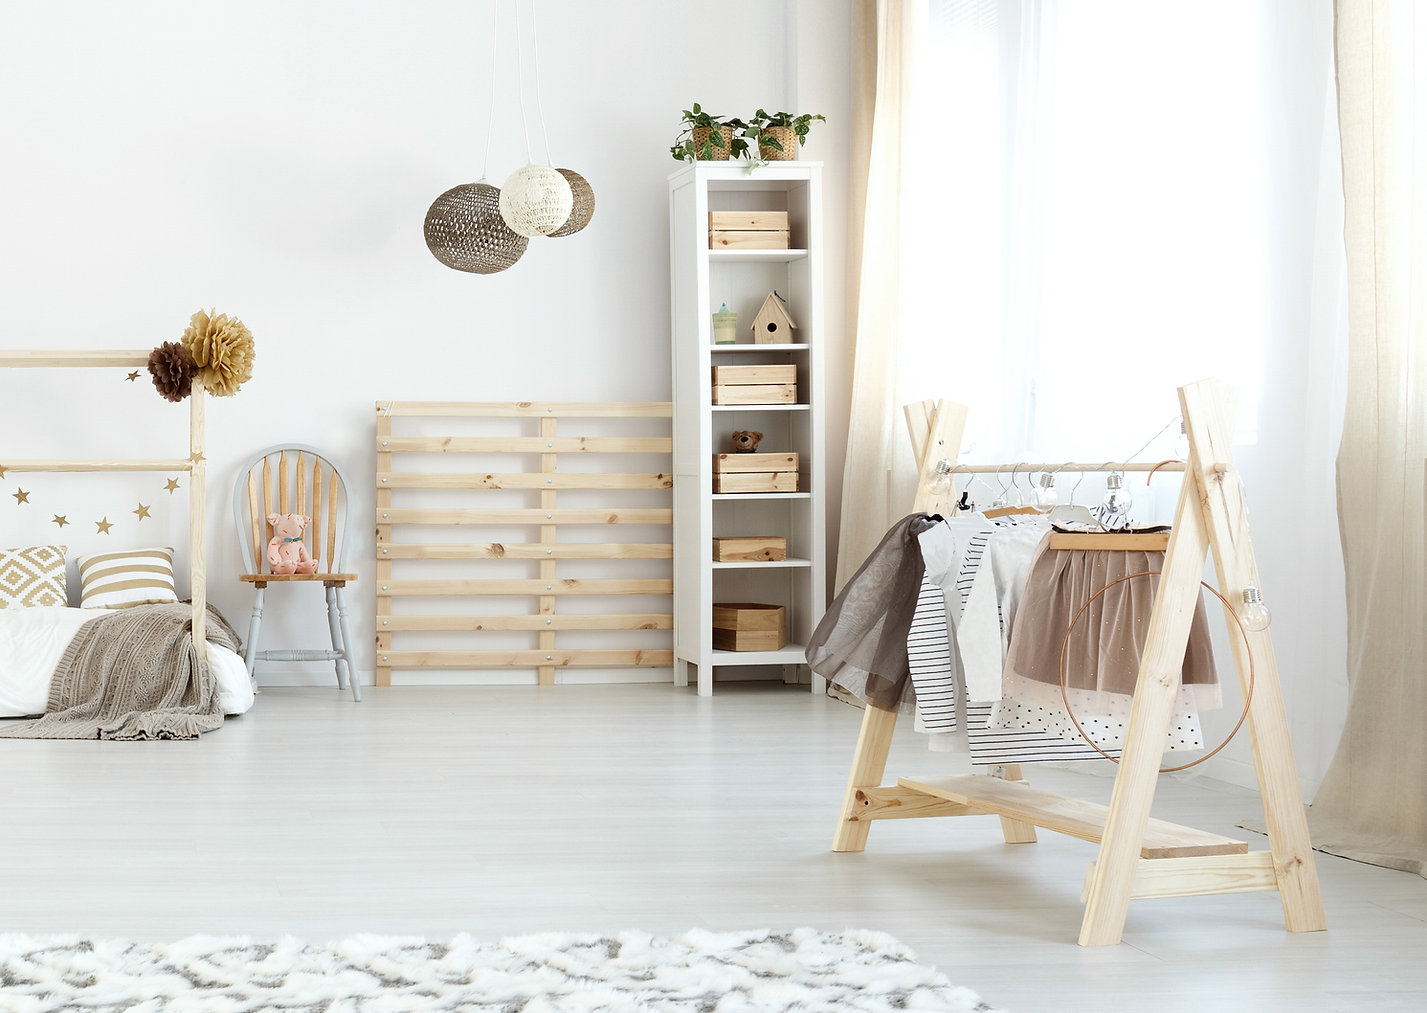 Home design background